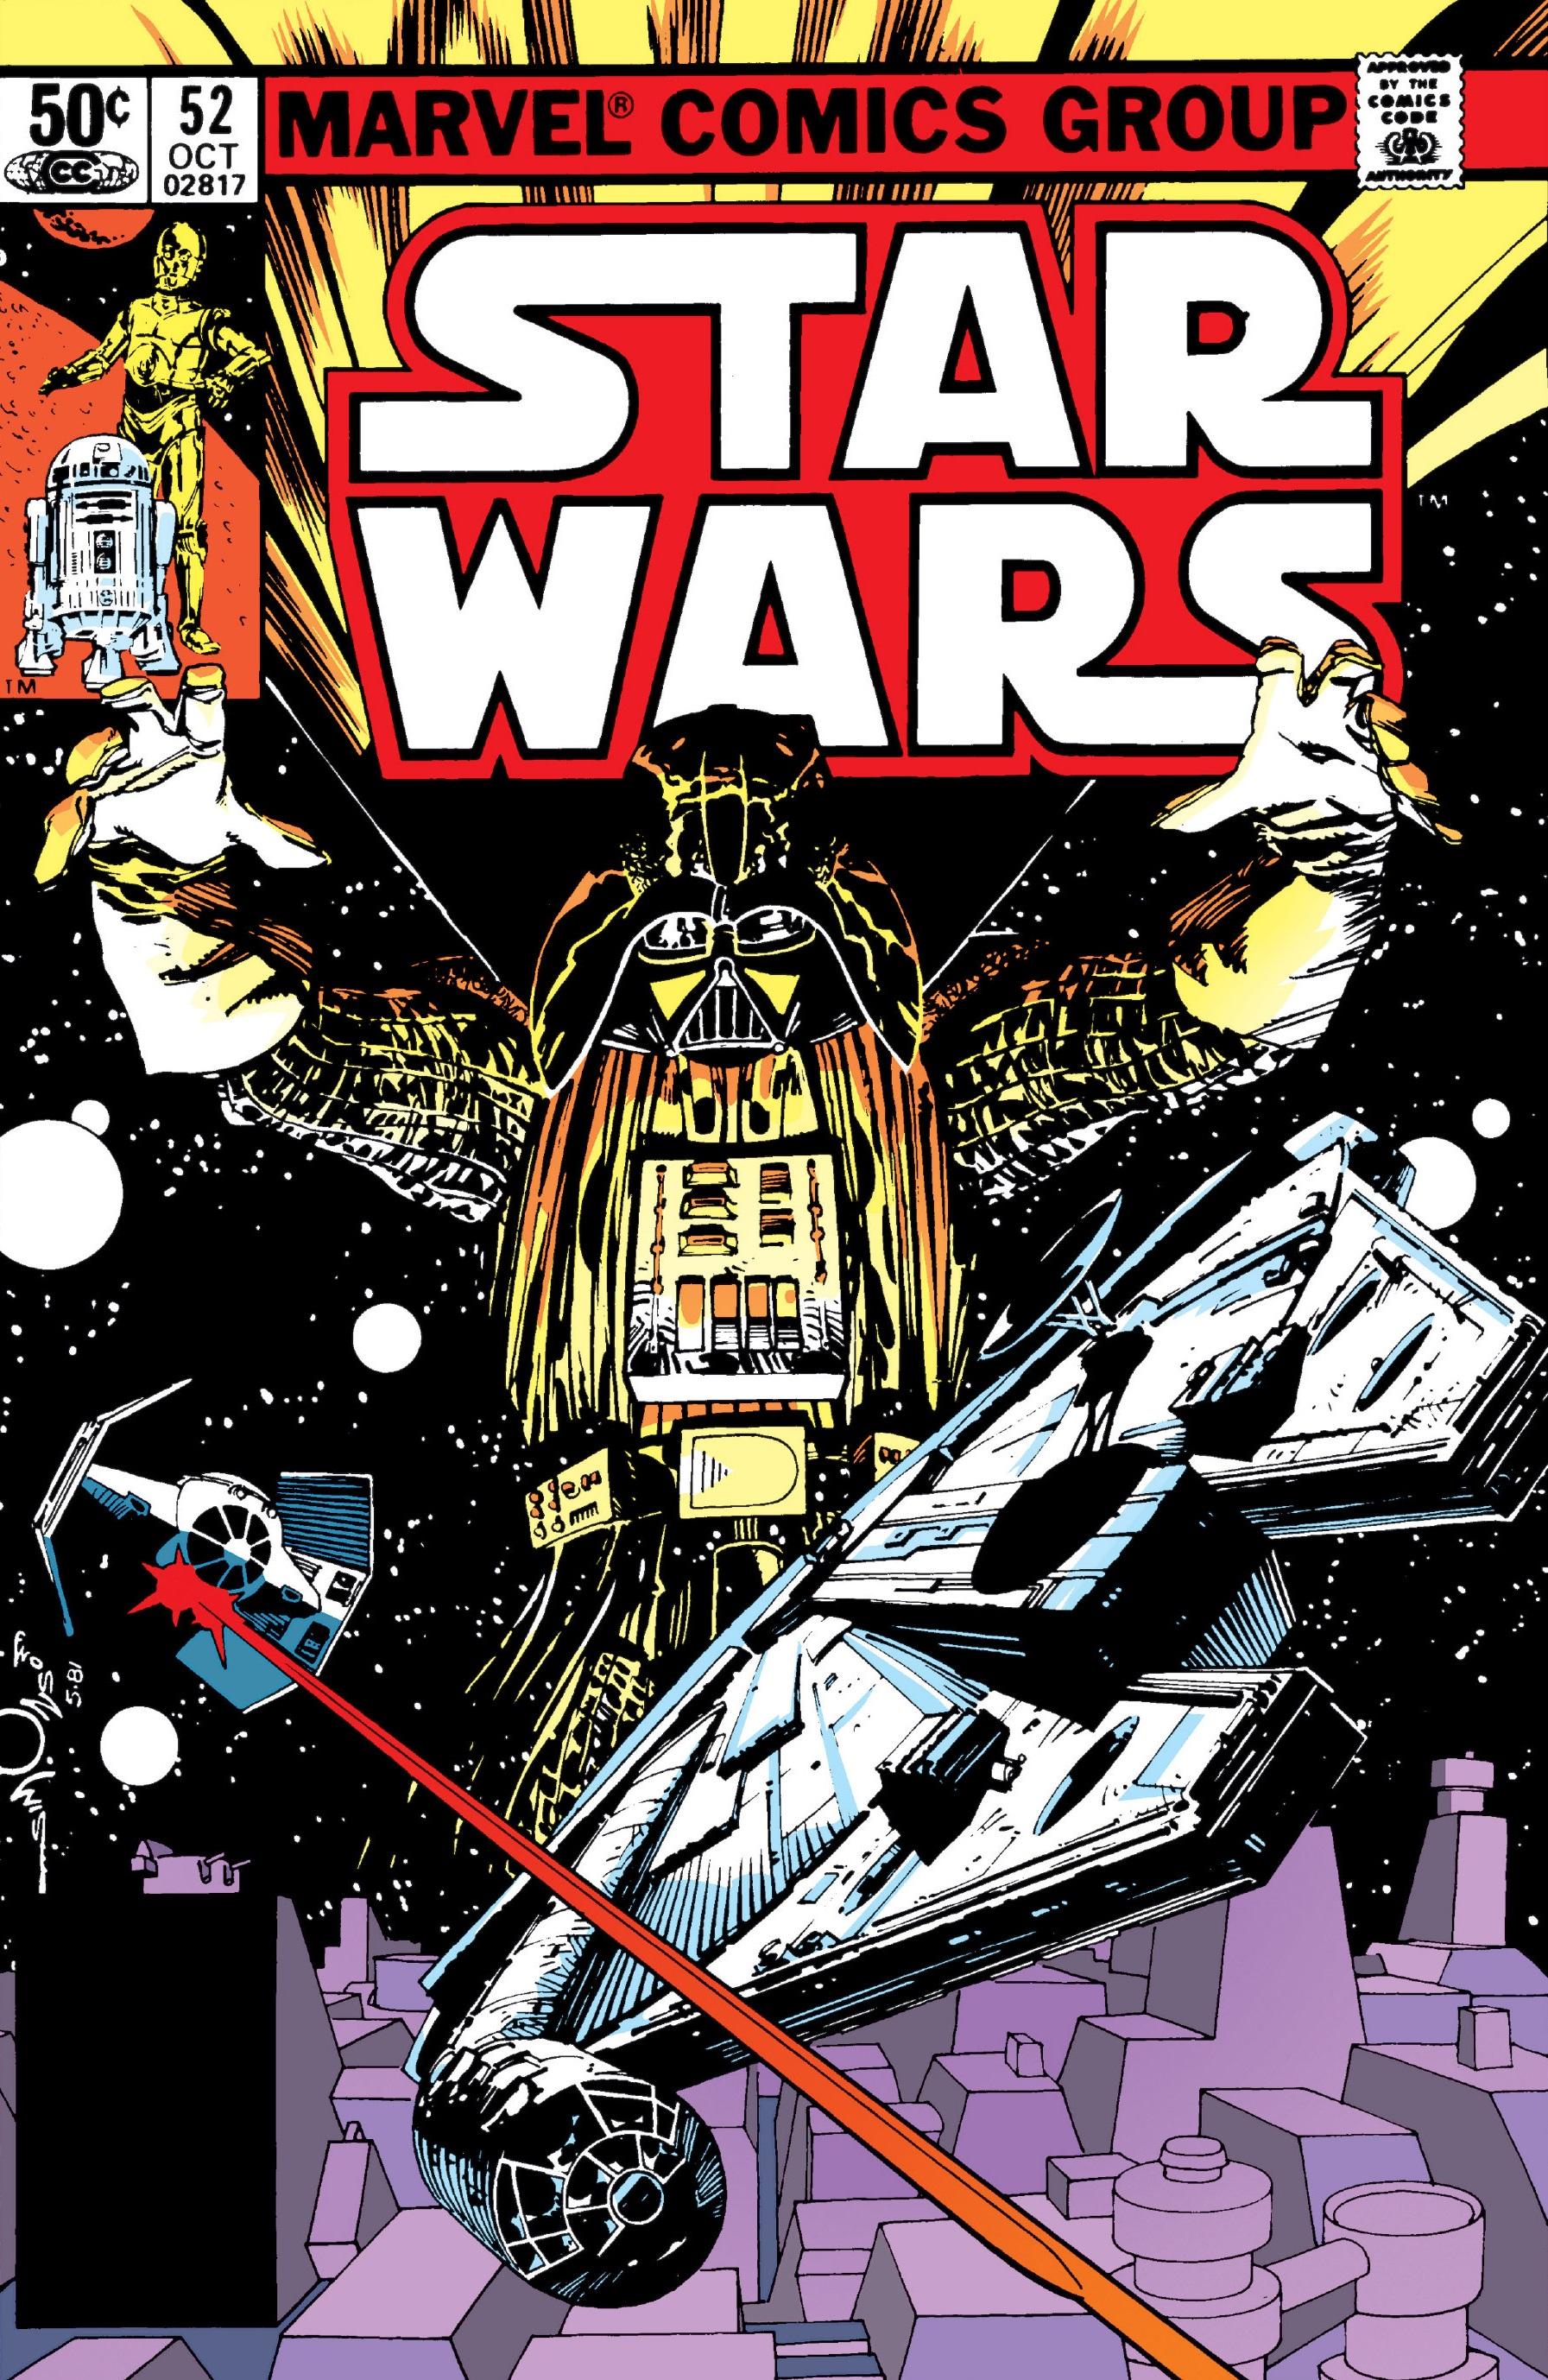 marvel comics 52